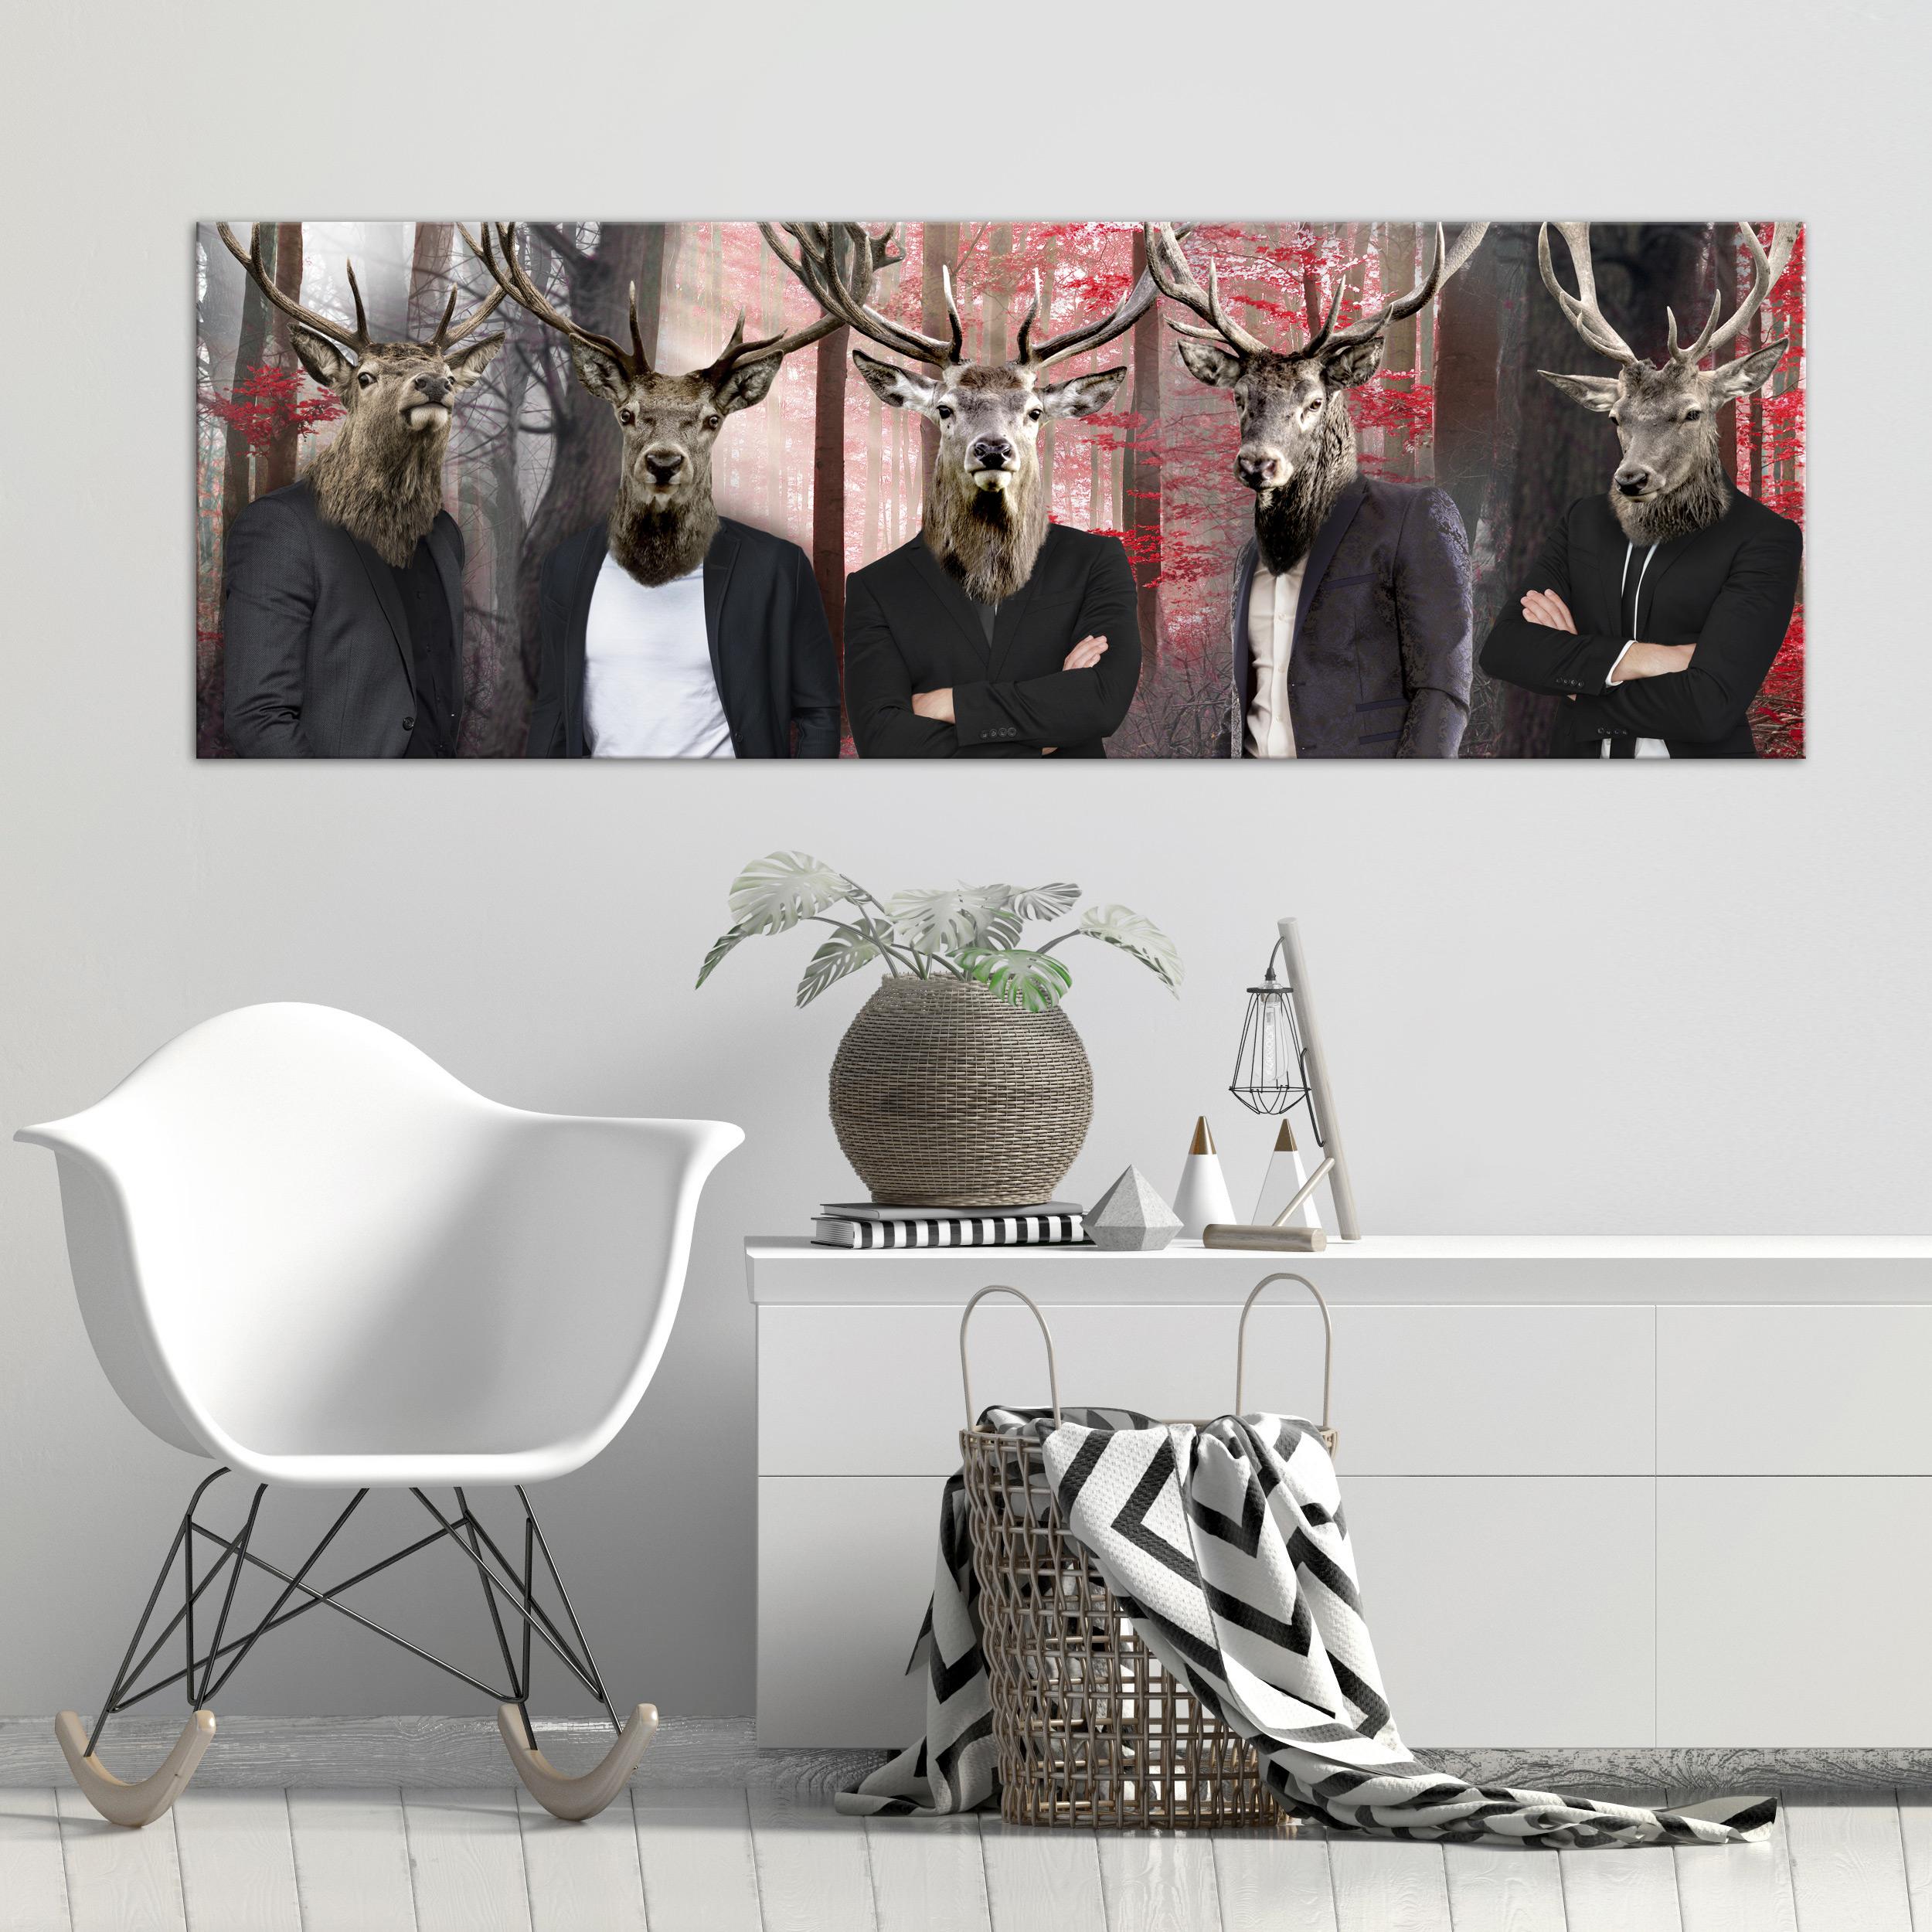 LEINWAND BILD Tiere Menschen Kunstdruck Modern Wandbilder ...